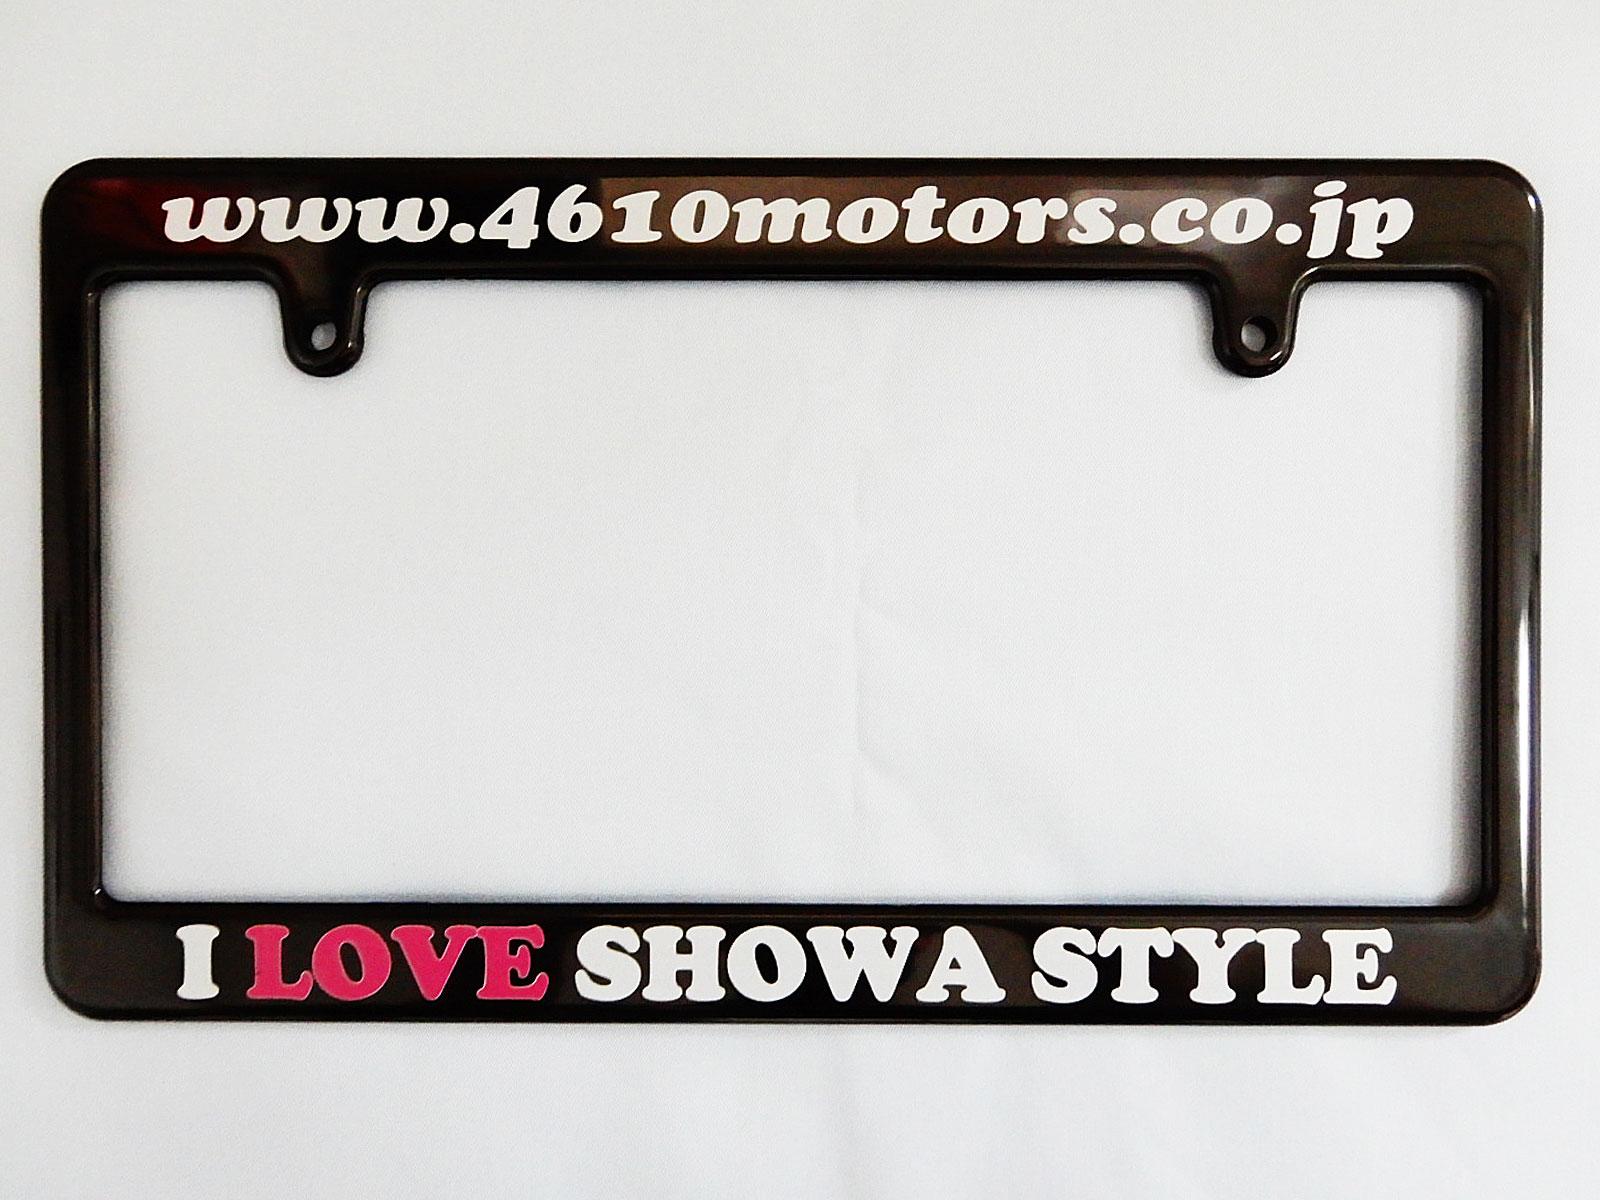 I LOVE SHOWA STYLE  WWW.4610MOTORS  Black License Frame Wide ☆ブラック ライセンスフレーム ワイド 日本ナンバープレートサイズ 幅広タイプ 4610MOTORS